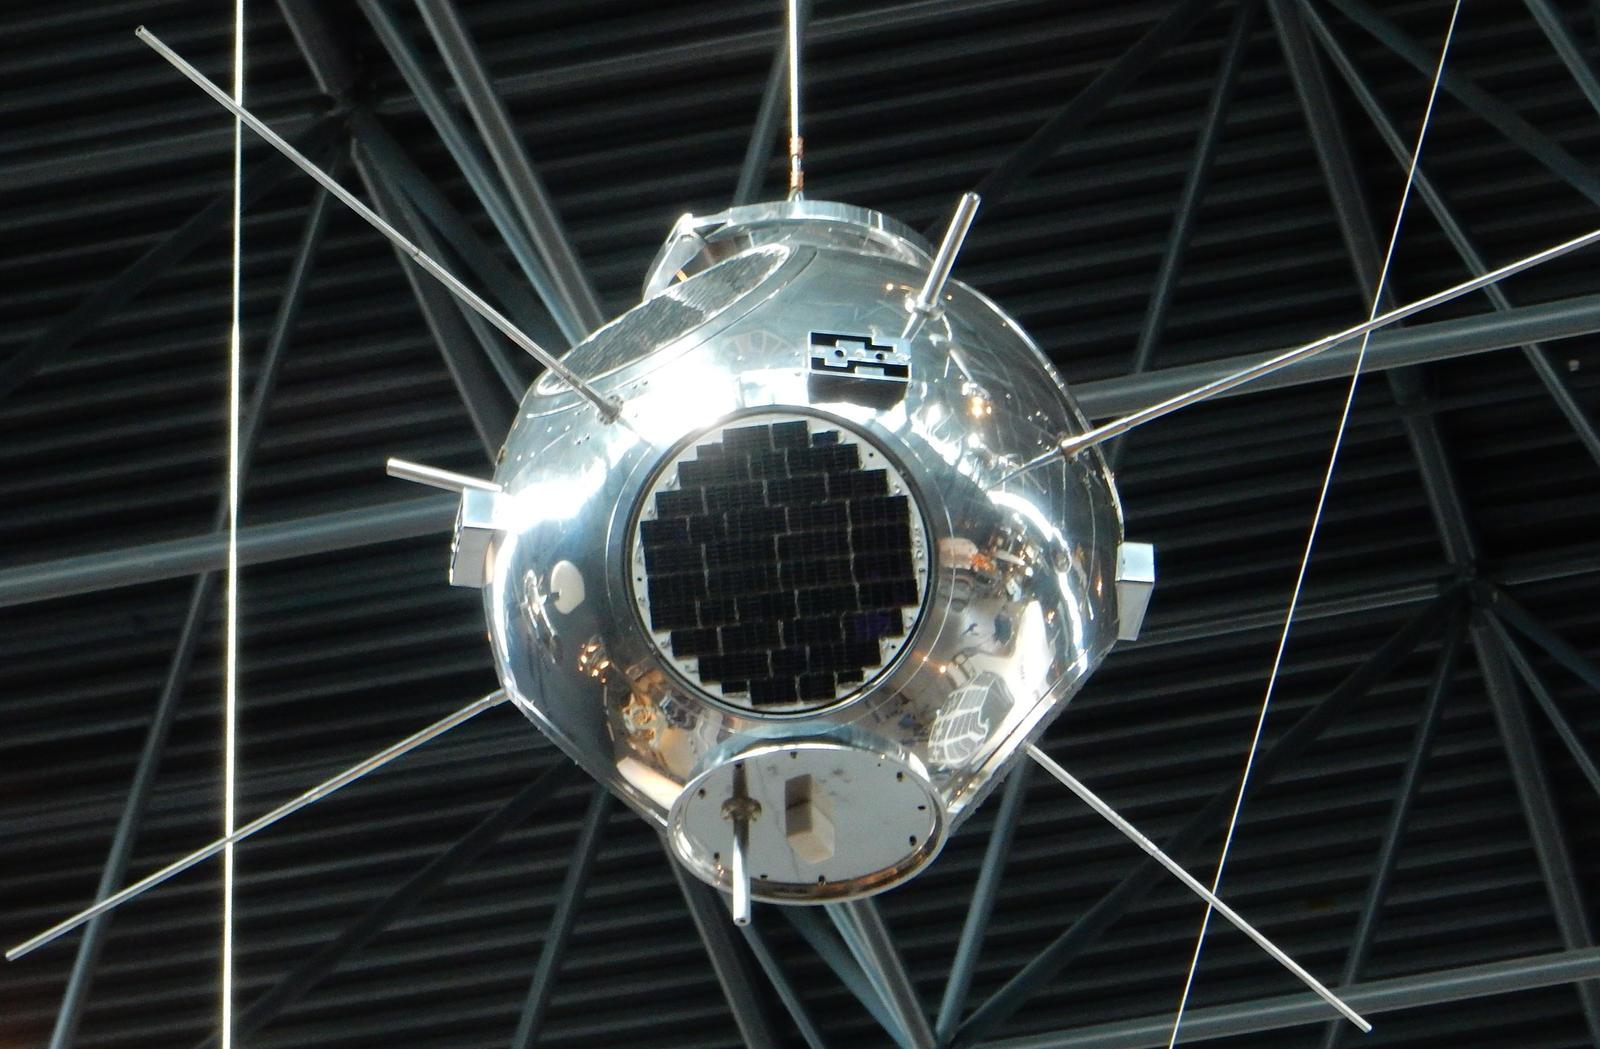 US Naval Research Laboratory LOFTI-1 Satellite by rlkitterman